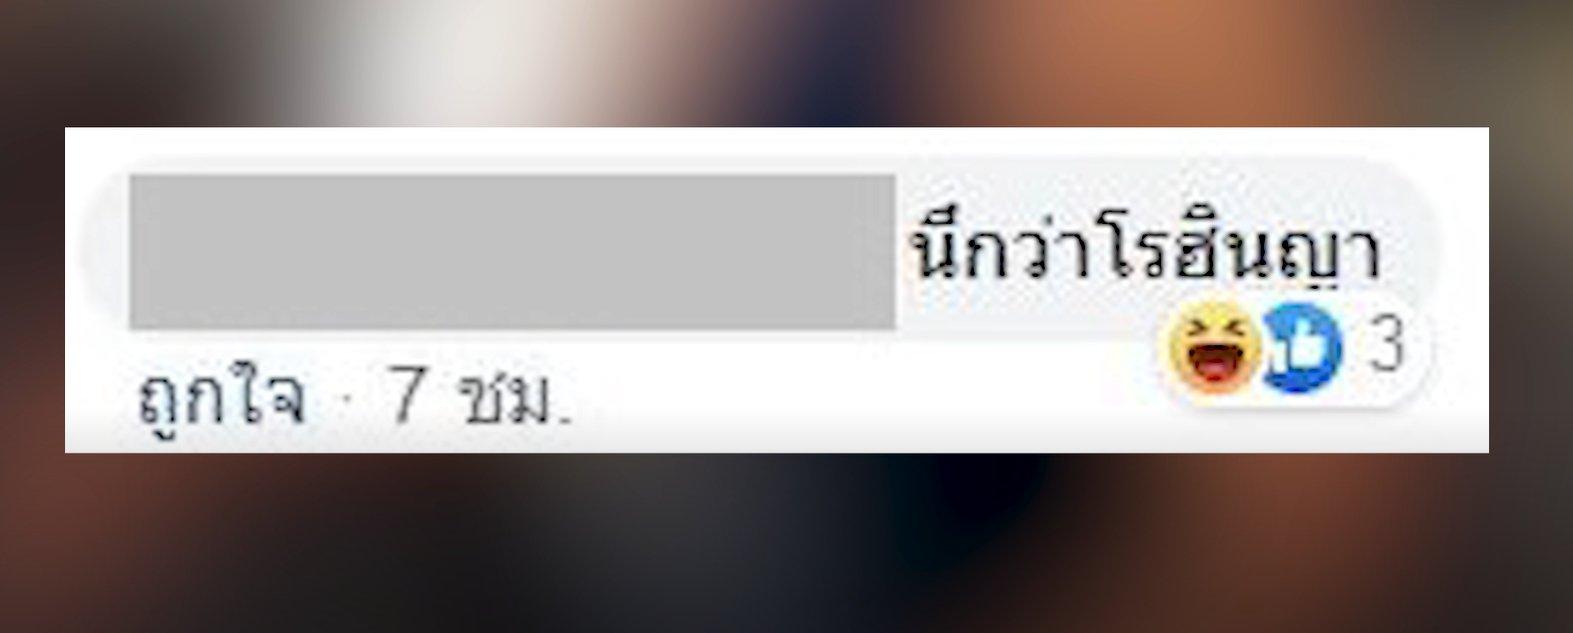 1604464414922